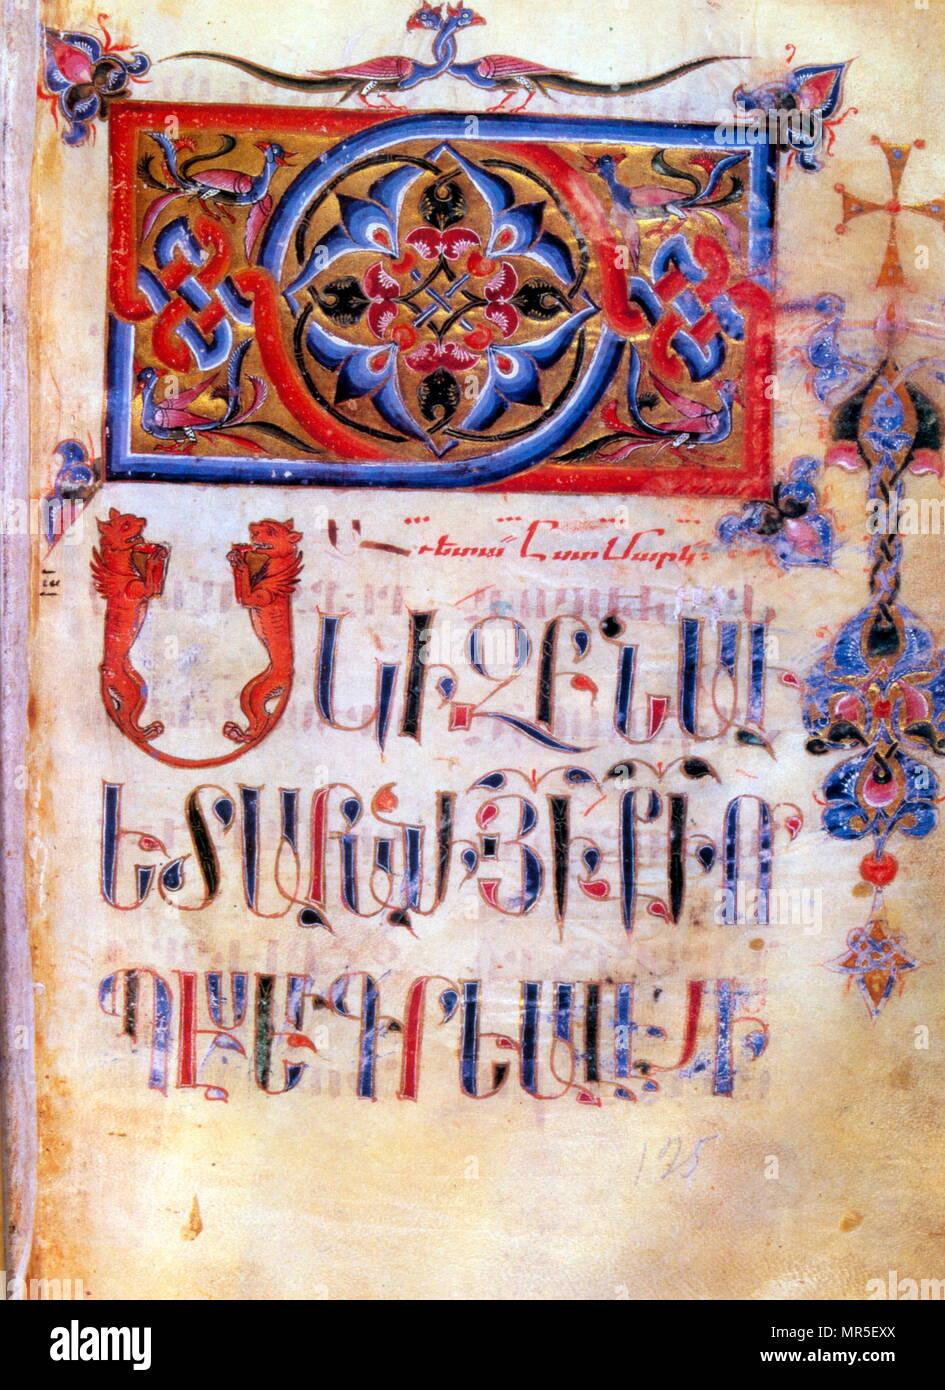 Armenian Christian illustrated manuscript of the 13th century - Stock Image